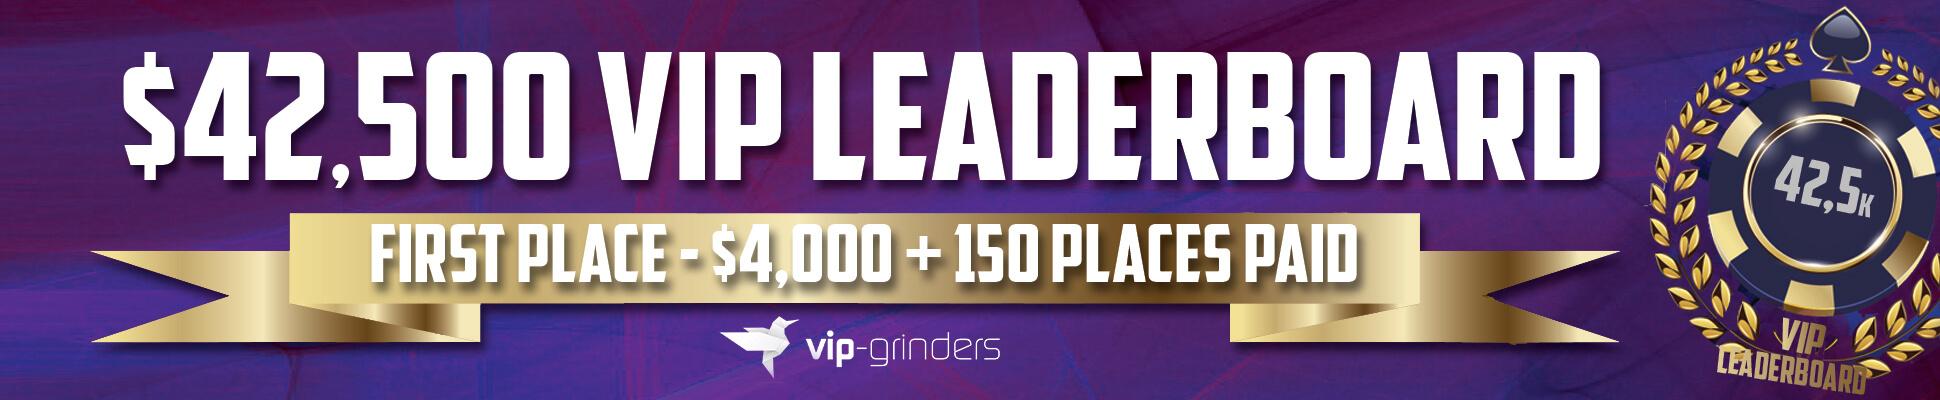 1940x400-2 42k vip leaderboard - final